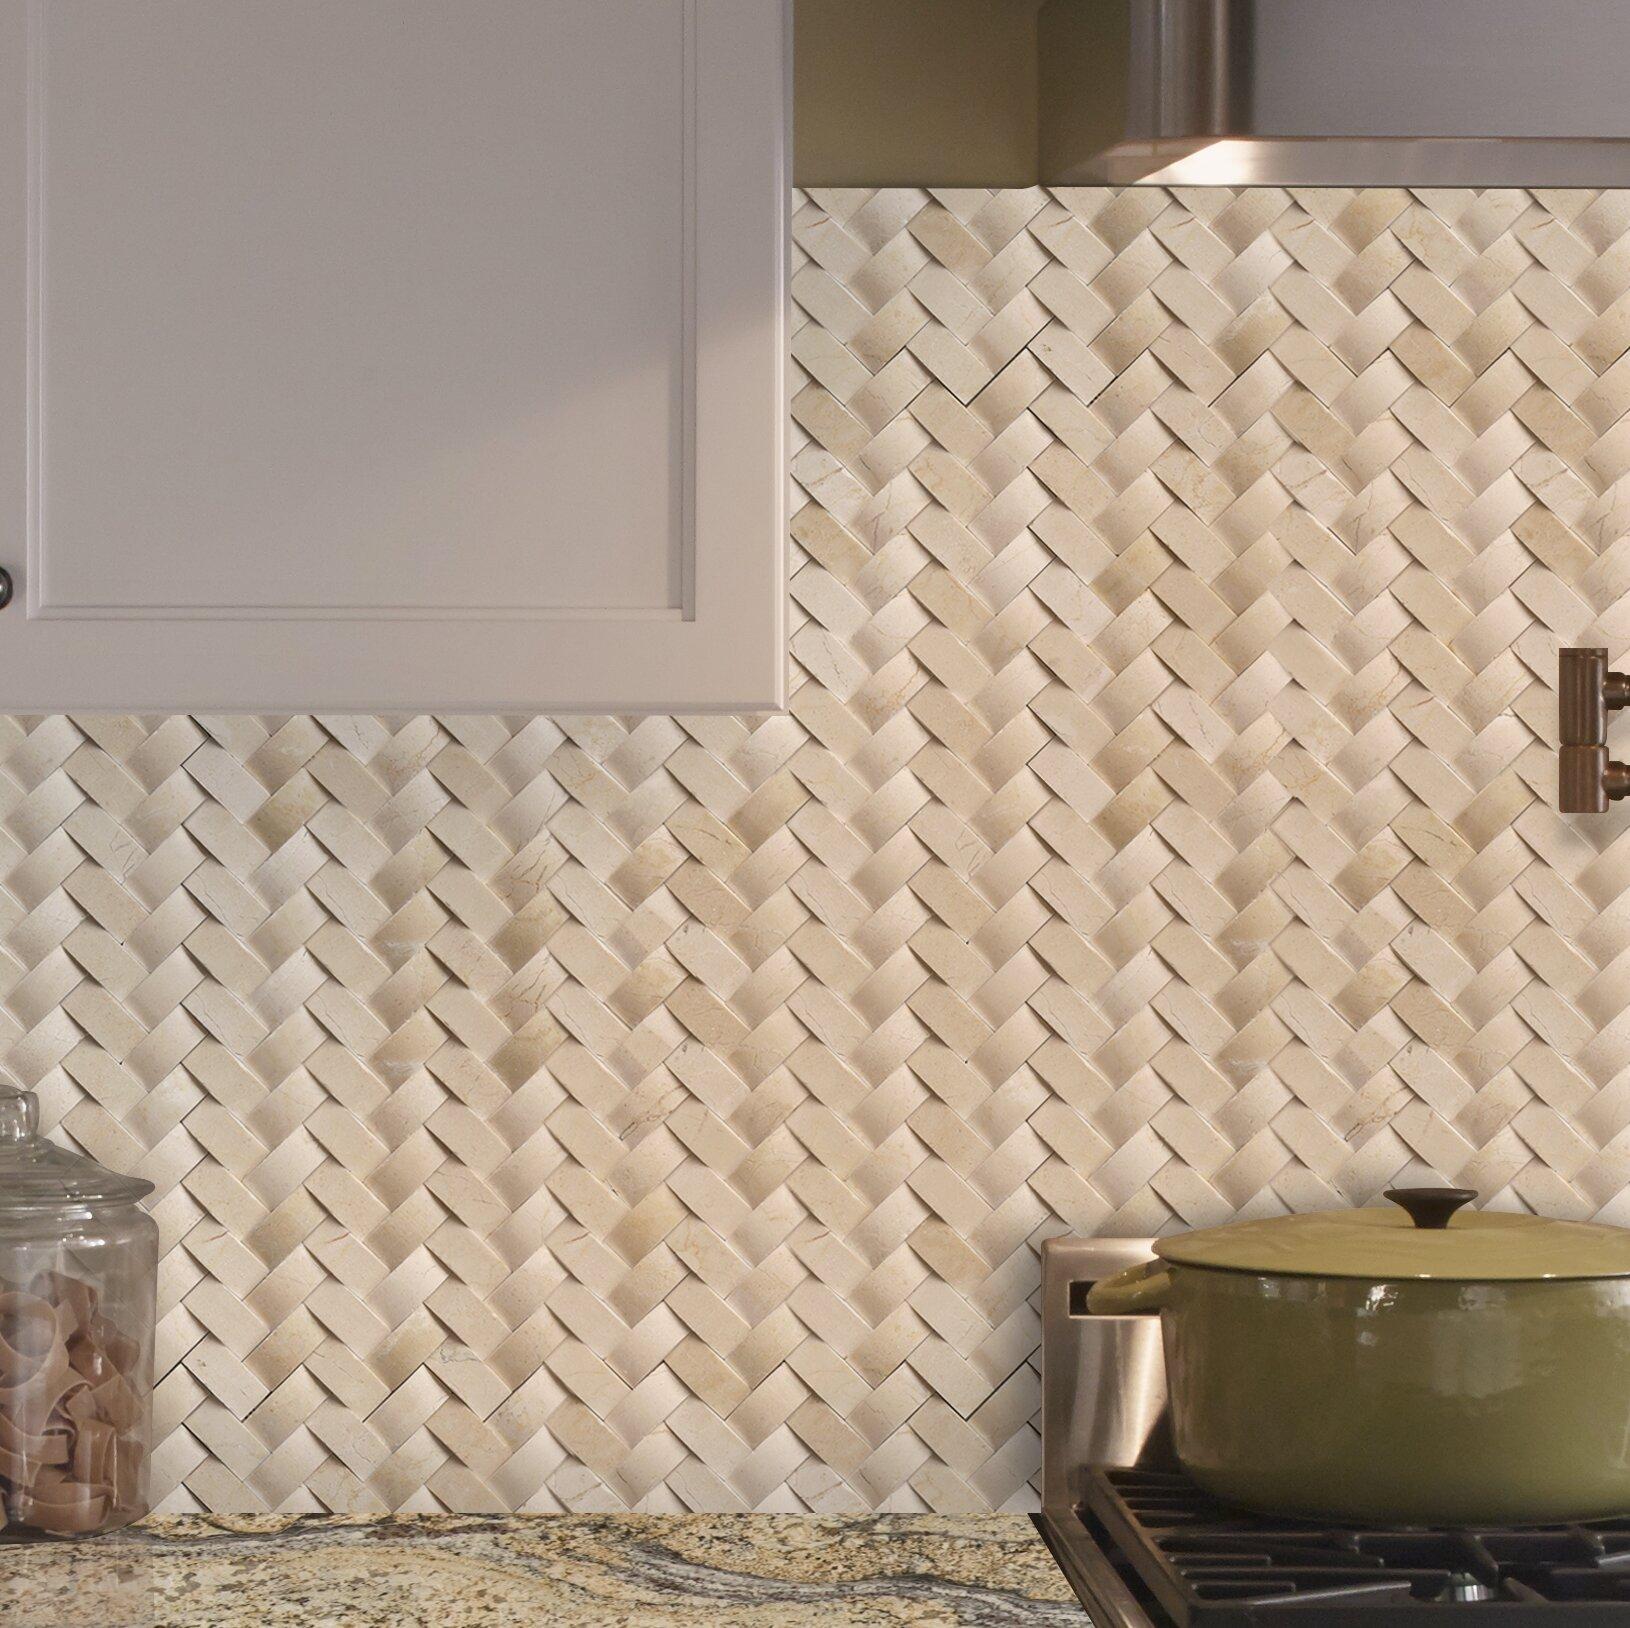 Herringbone Chevron Marble Backsplash Tile You Ll Love In 2020